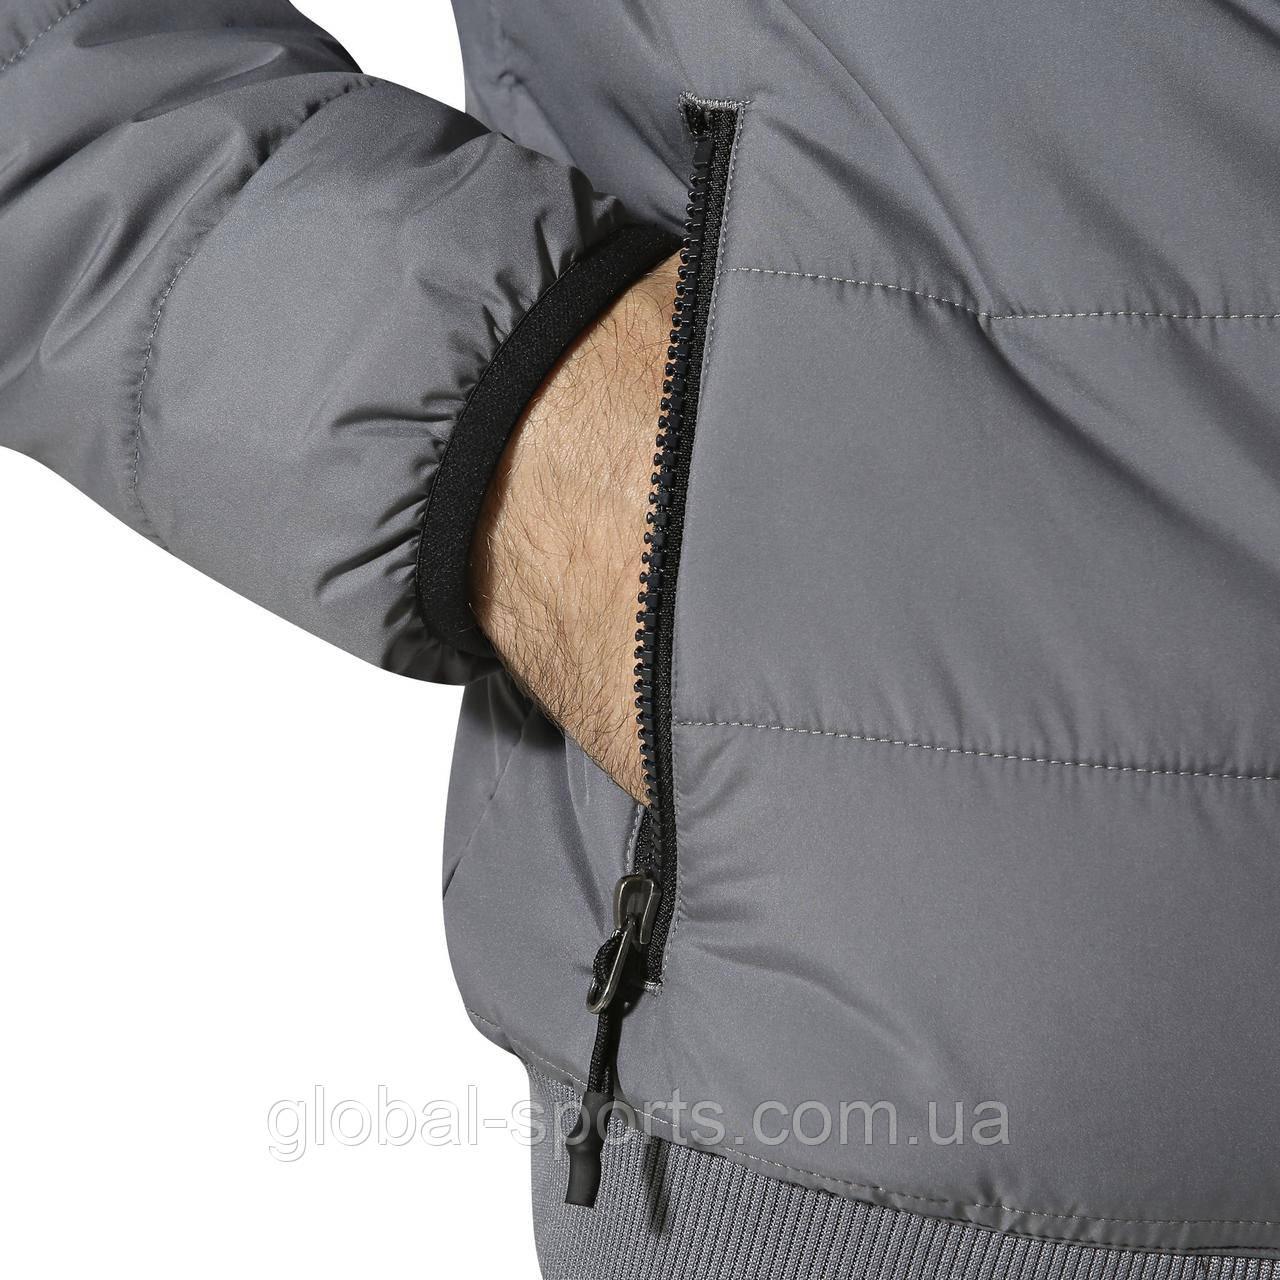 68ce9e32db60 Мужская куртка Reebok Outdoor (Артикул  D78646)  продажа, цена в ...